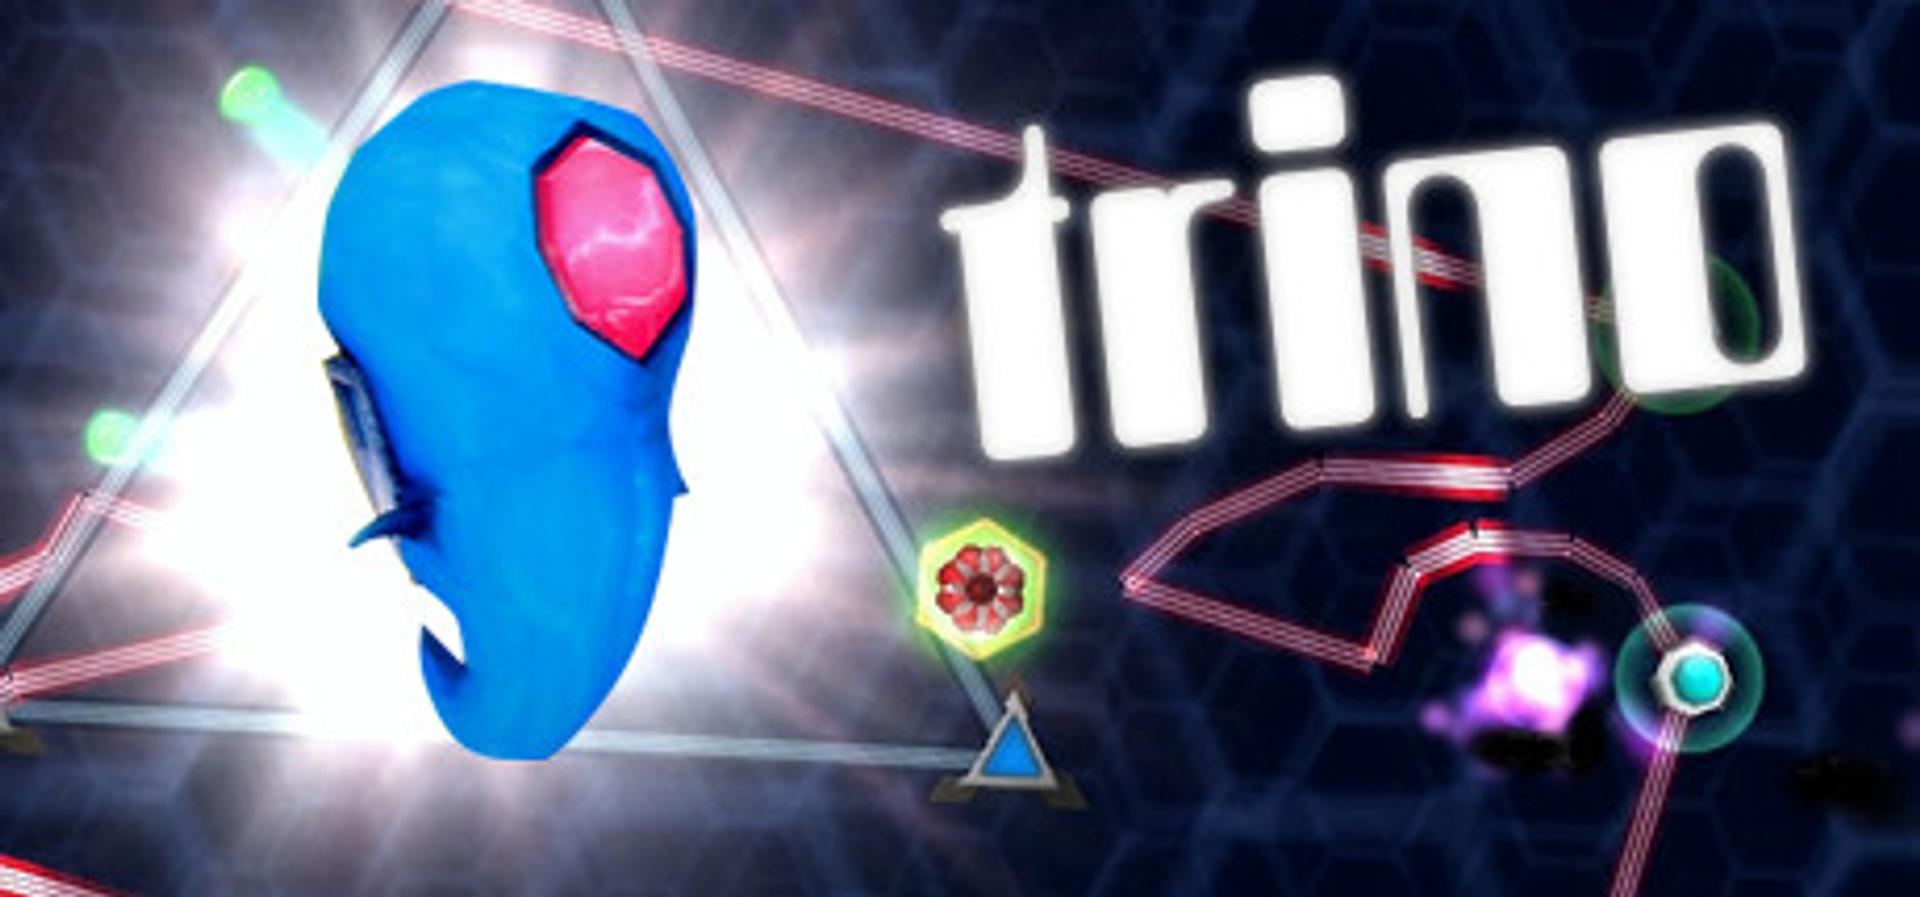 buy Trino cd key for pc platform